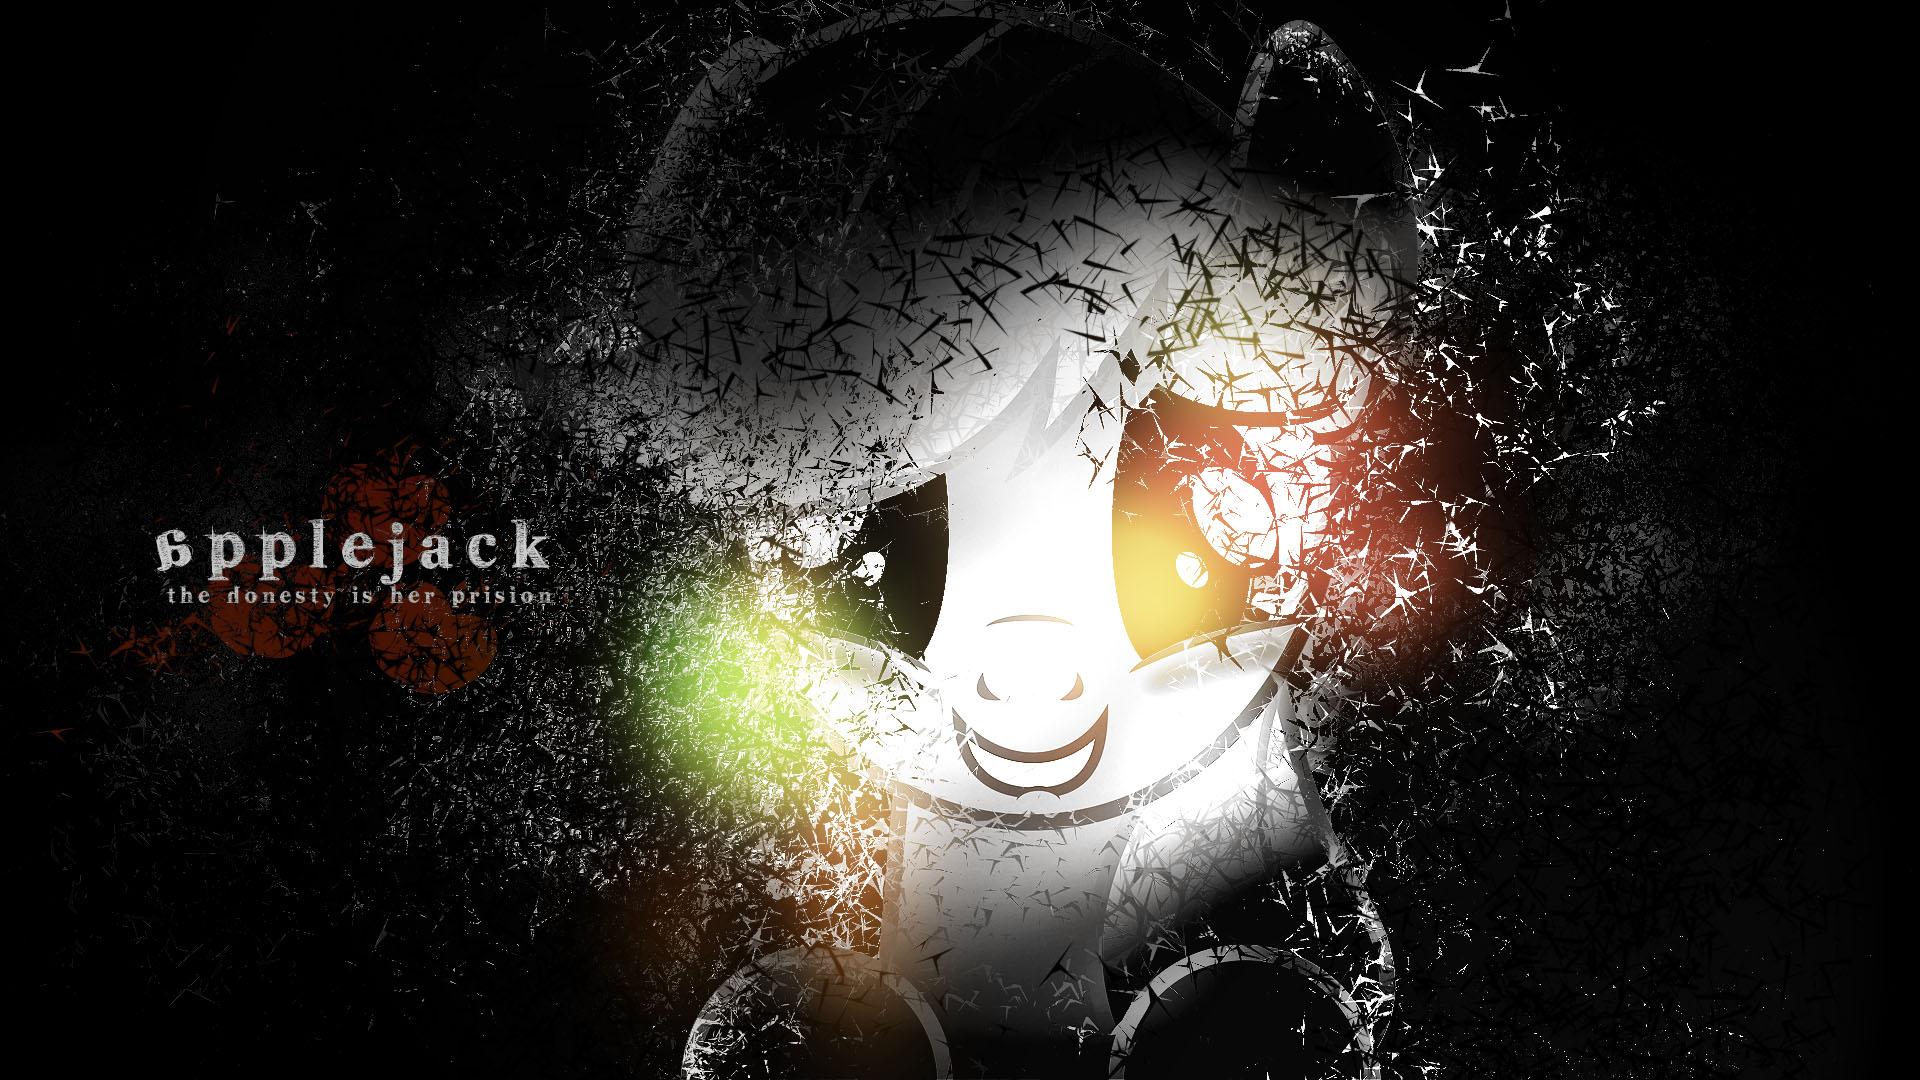 Prison Applejack by teiptr and Xtrl